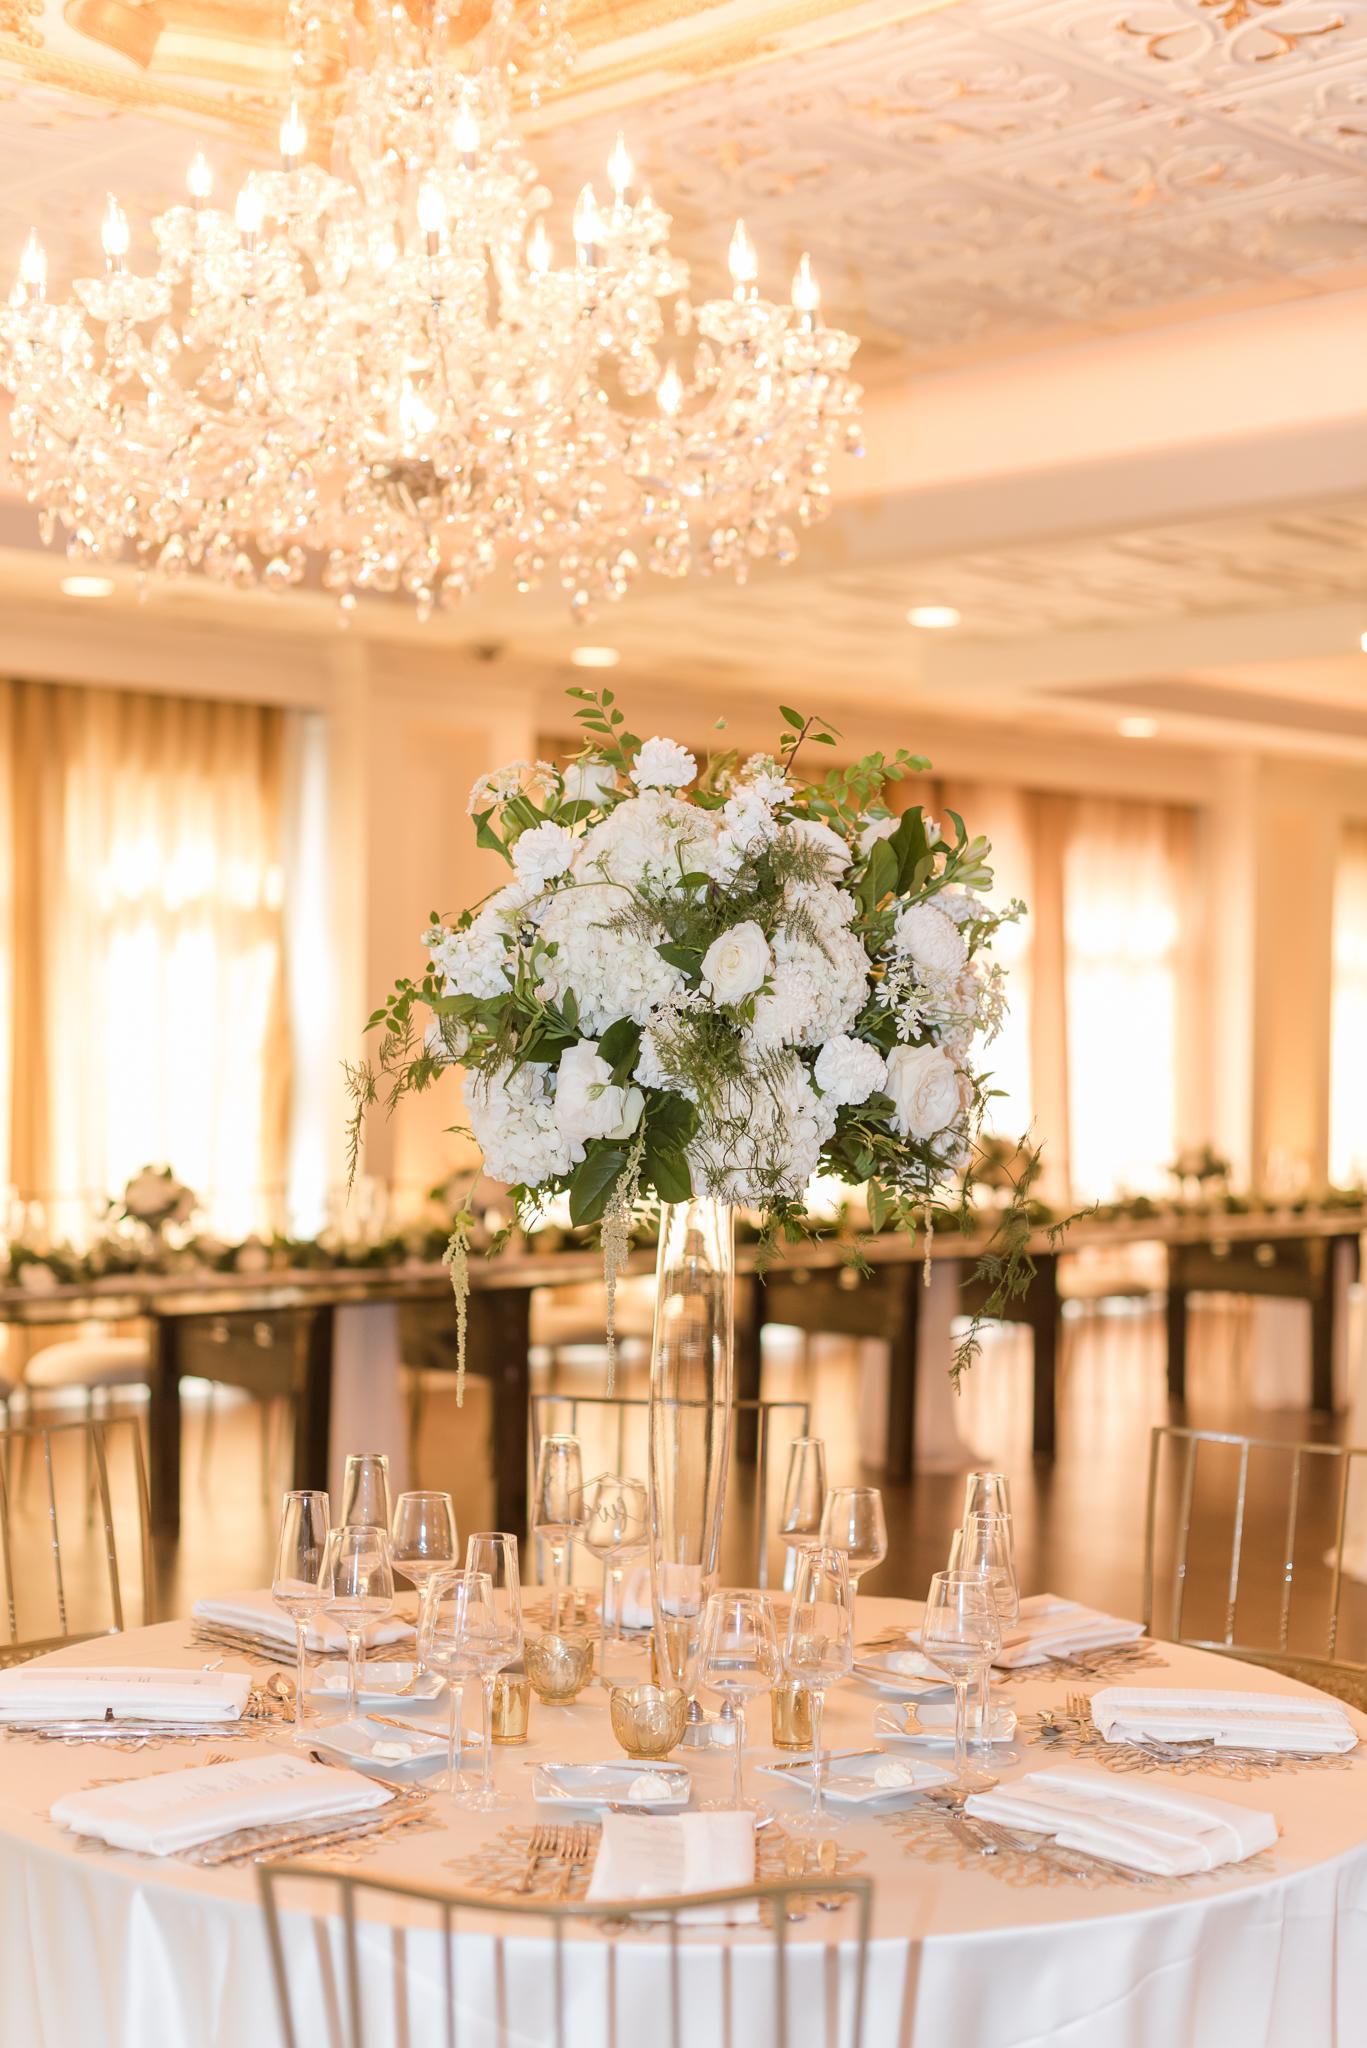 Black Iris Estate Wedding Elegant White with Greenery Luxury High End Flowers-18.jpg